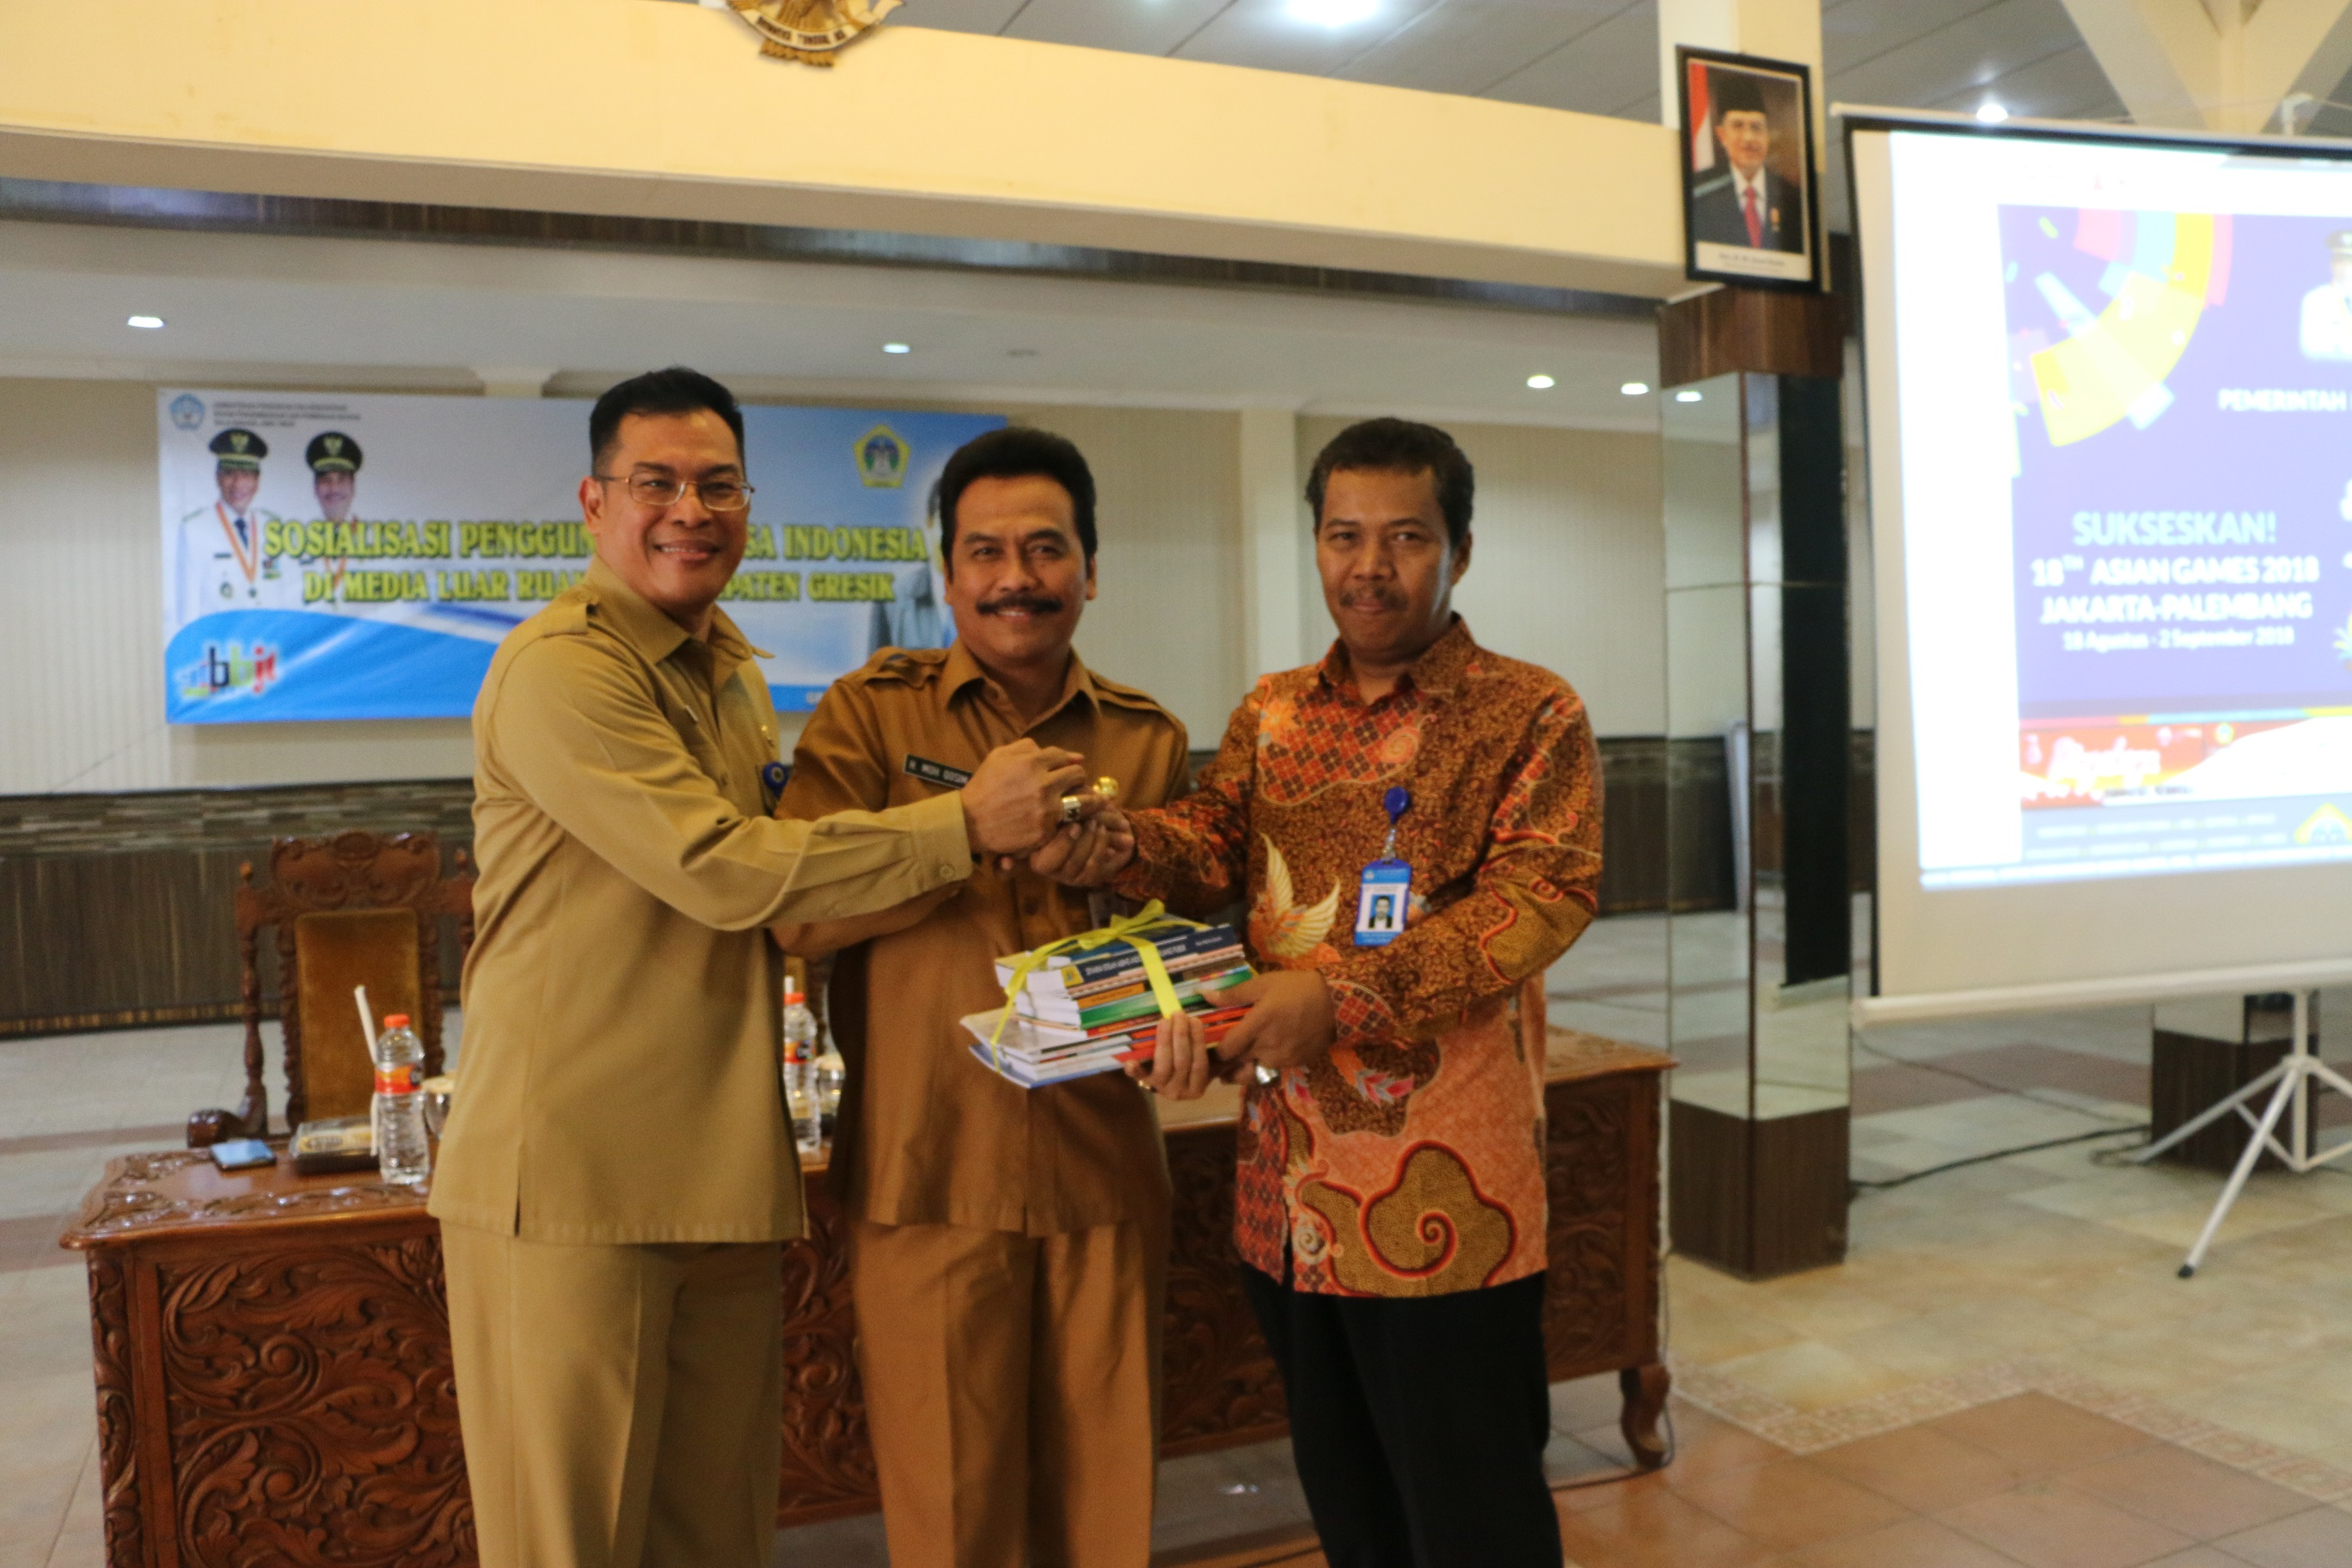 Wabup Qosim: Bahasa Indonesia Menjadi Pemersatu